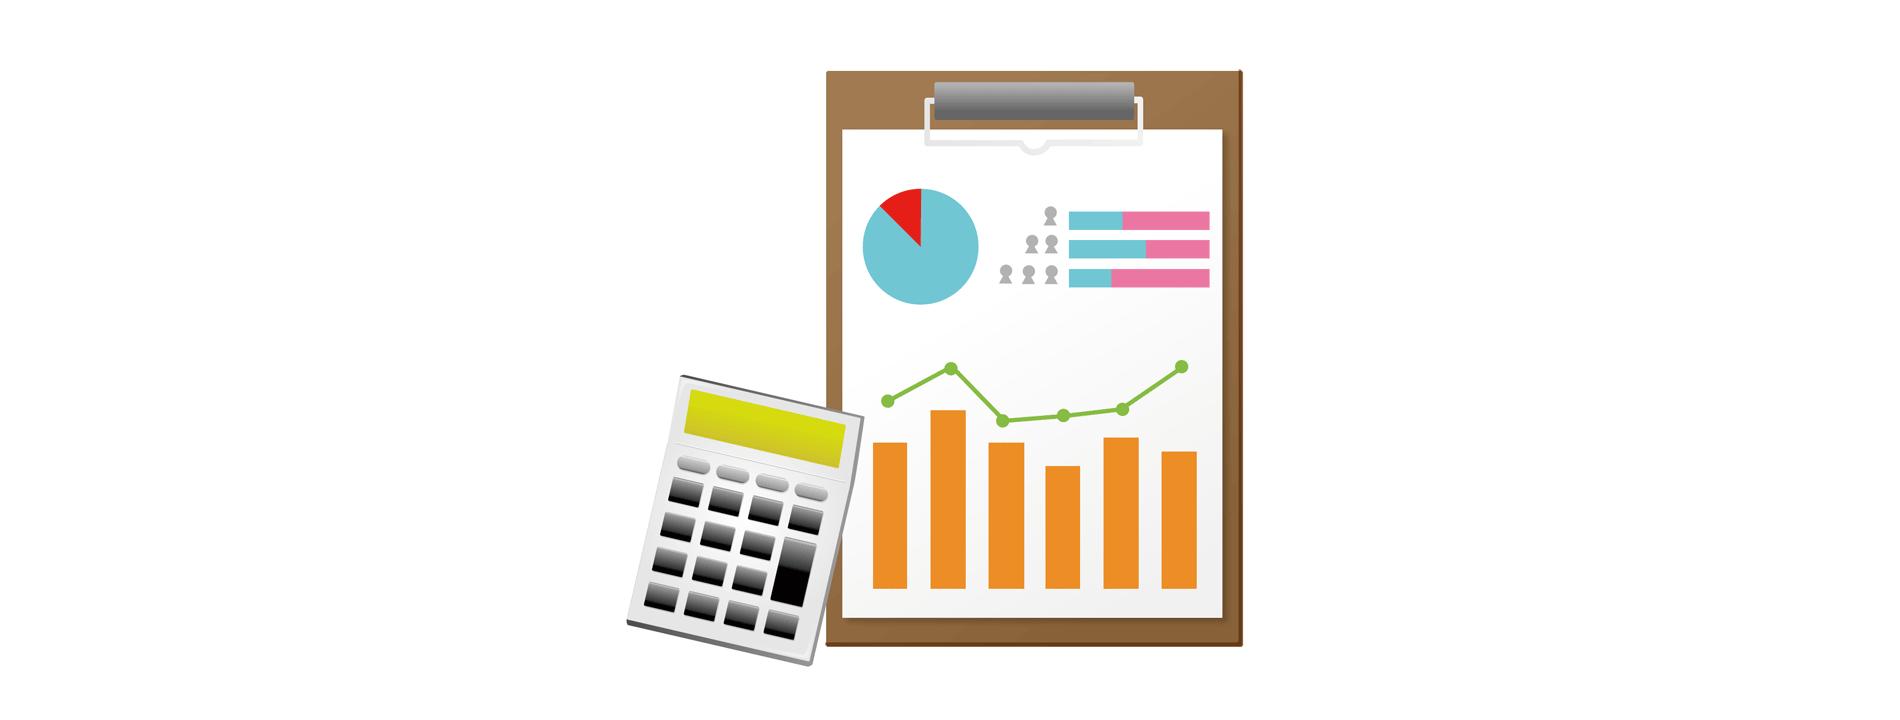 SEO対策を業者に頼む際の費用の相場はどれくらい?